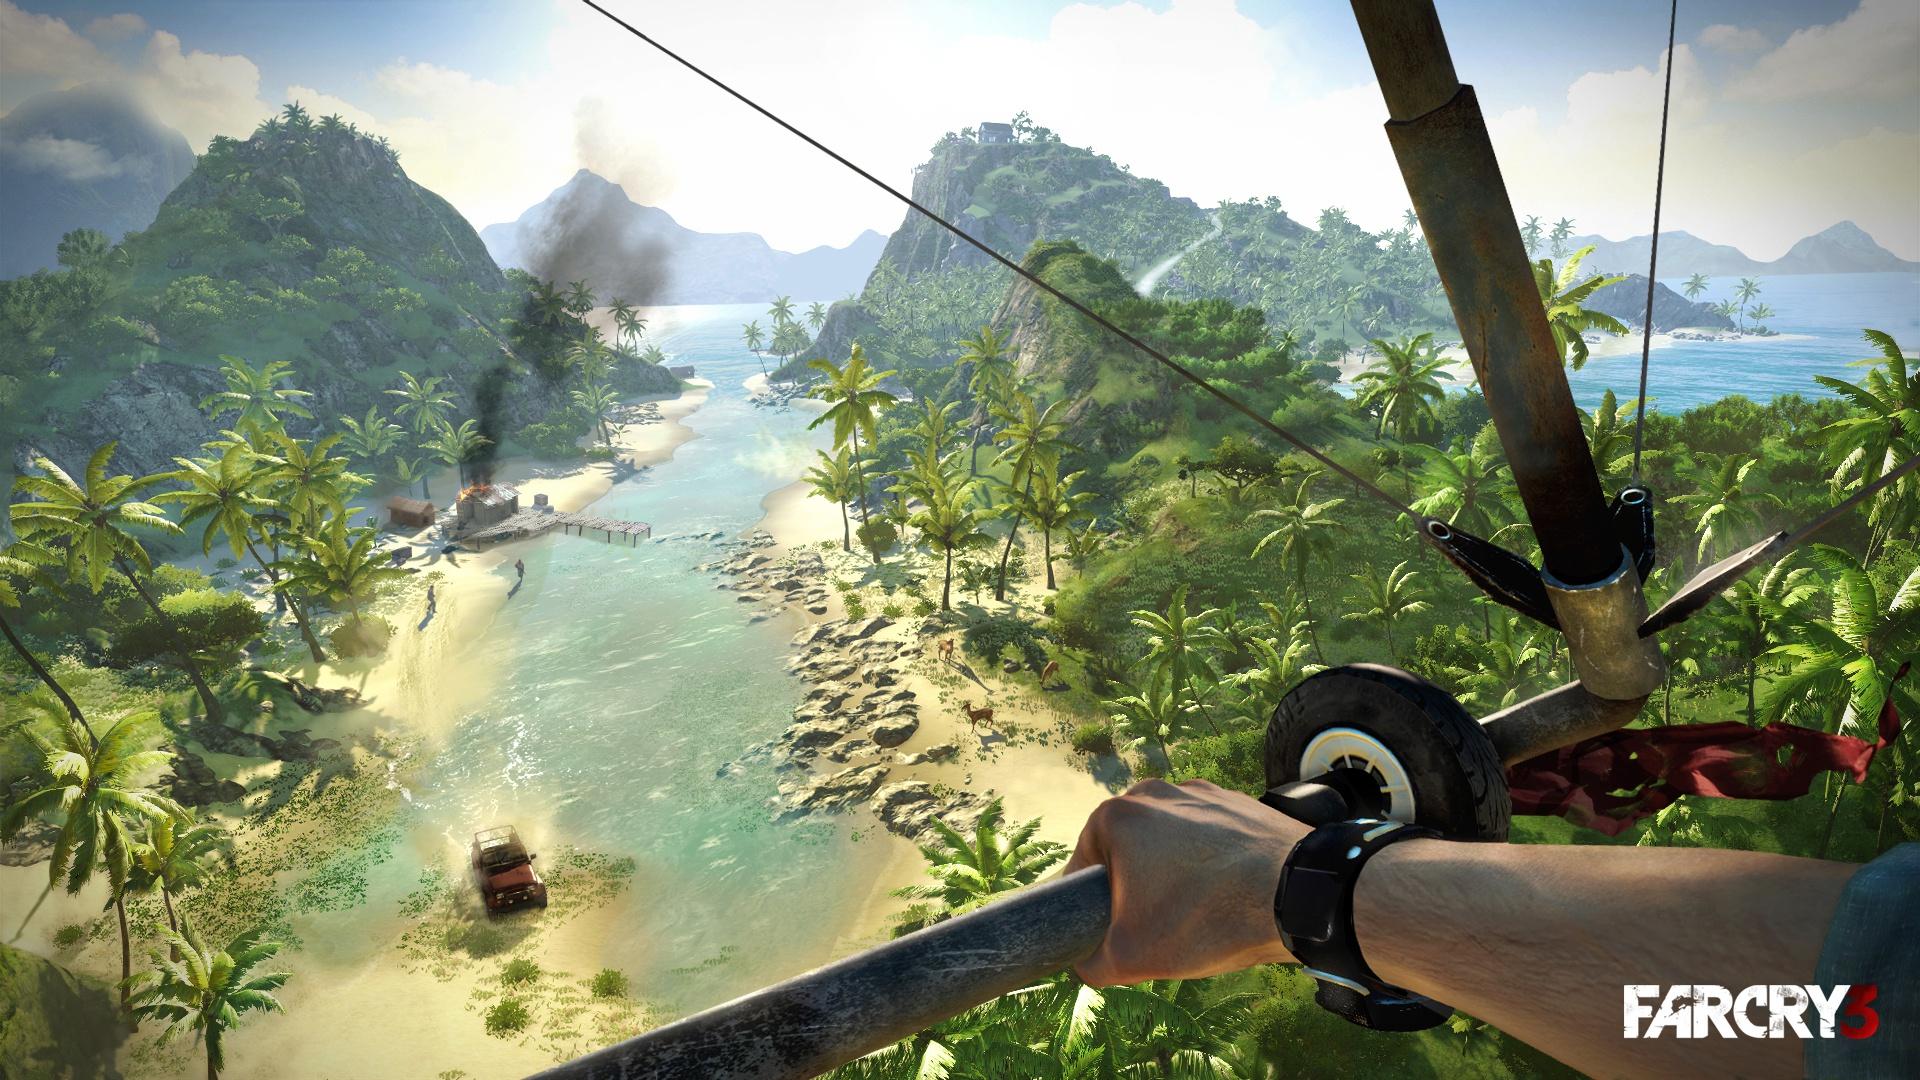 Wallpaper Video Games Far Cry 3 1920x1080 Utp 1171926 Hd